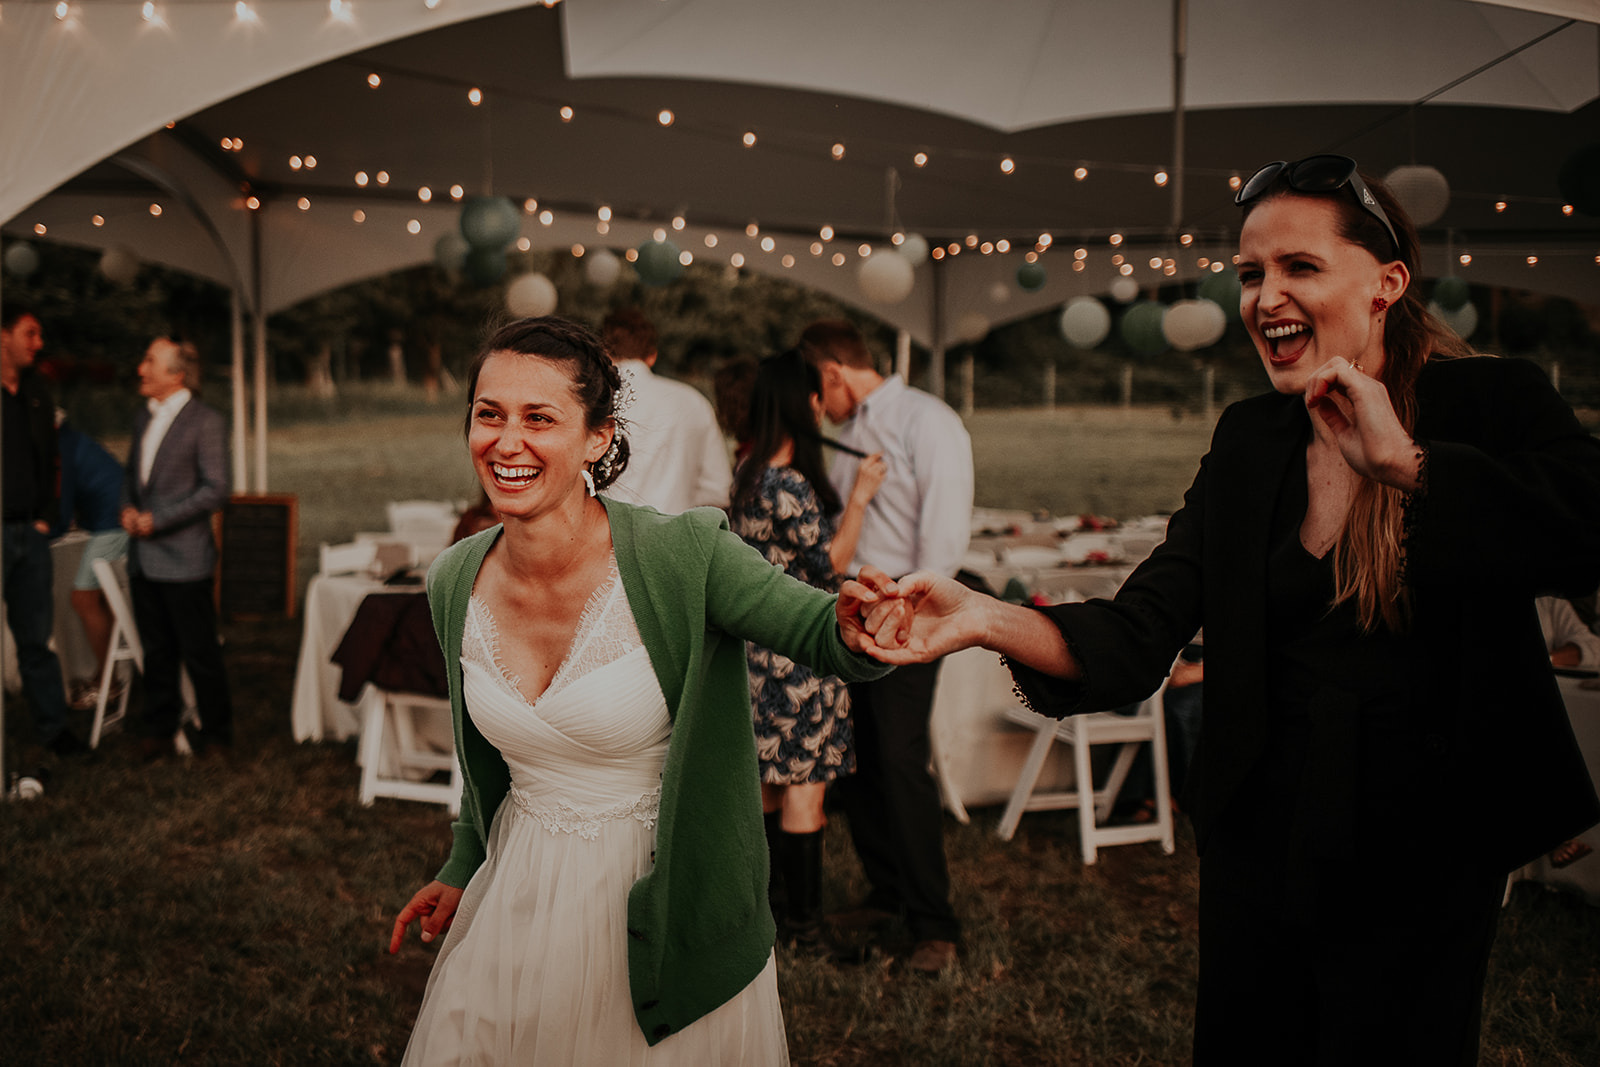 north-cascades-elopement-wedding-winthrop-wedding-photographer-megan-gallagher-photography (46).jpg